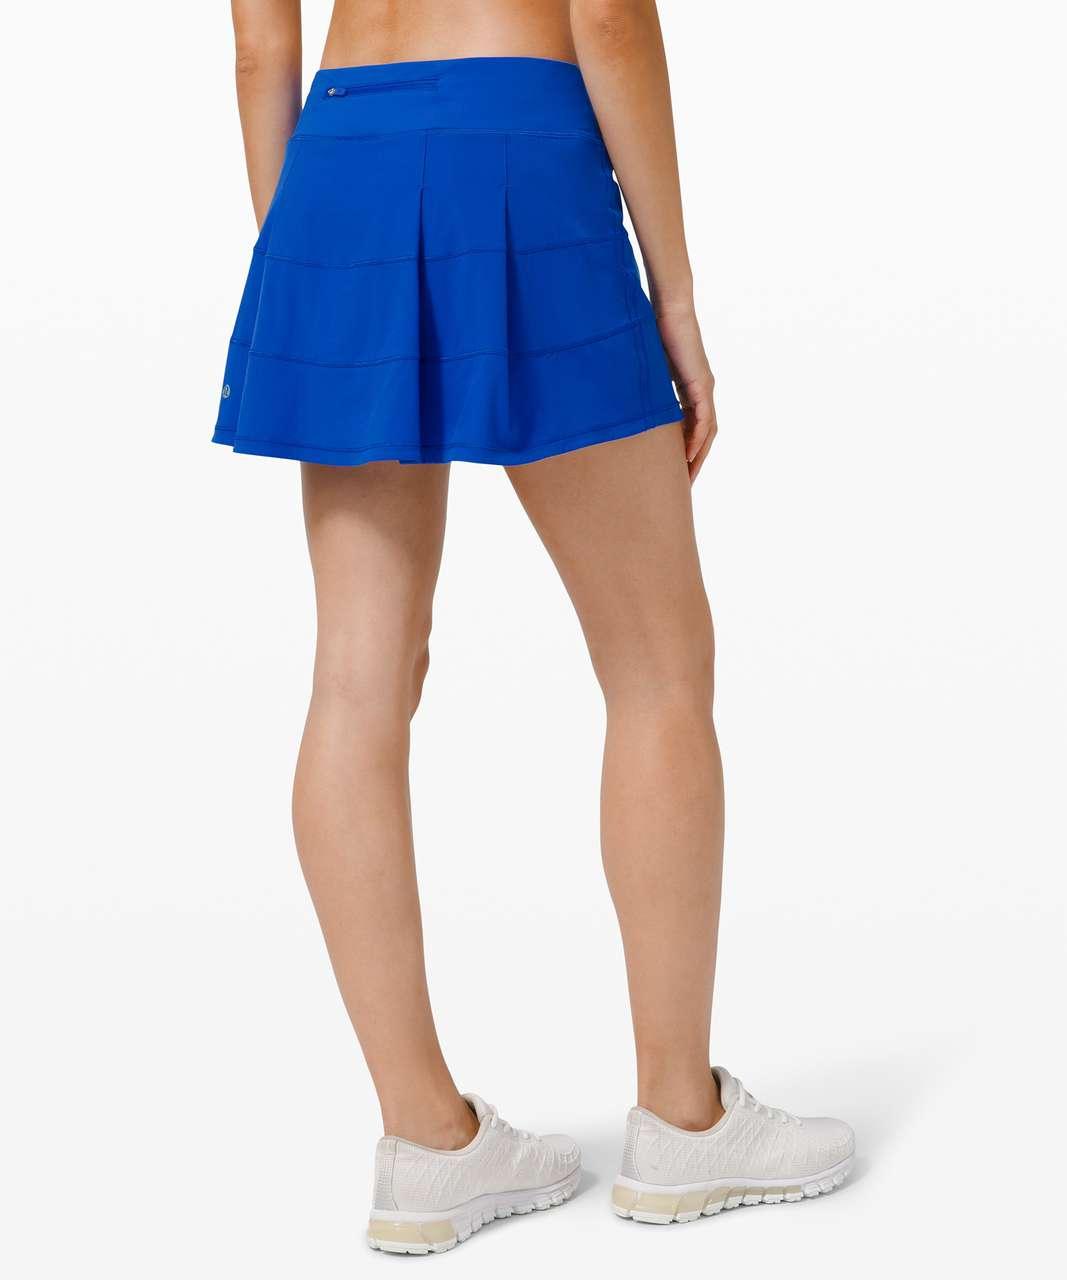 "Lululemon Pace Rival Skirt (Tall) *4-way Stretch 15"" - Cerulean Blue"